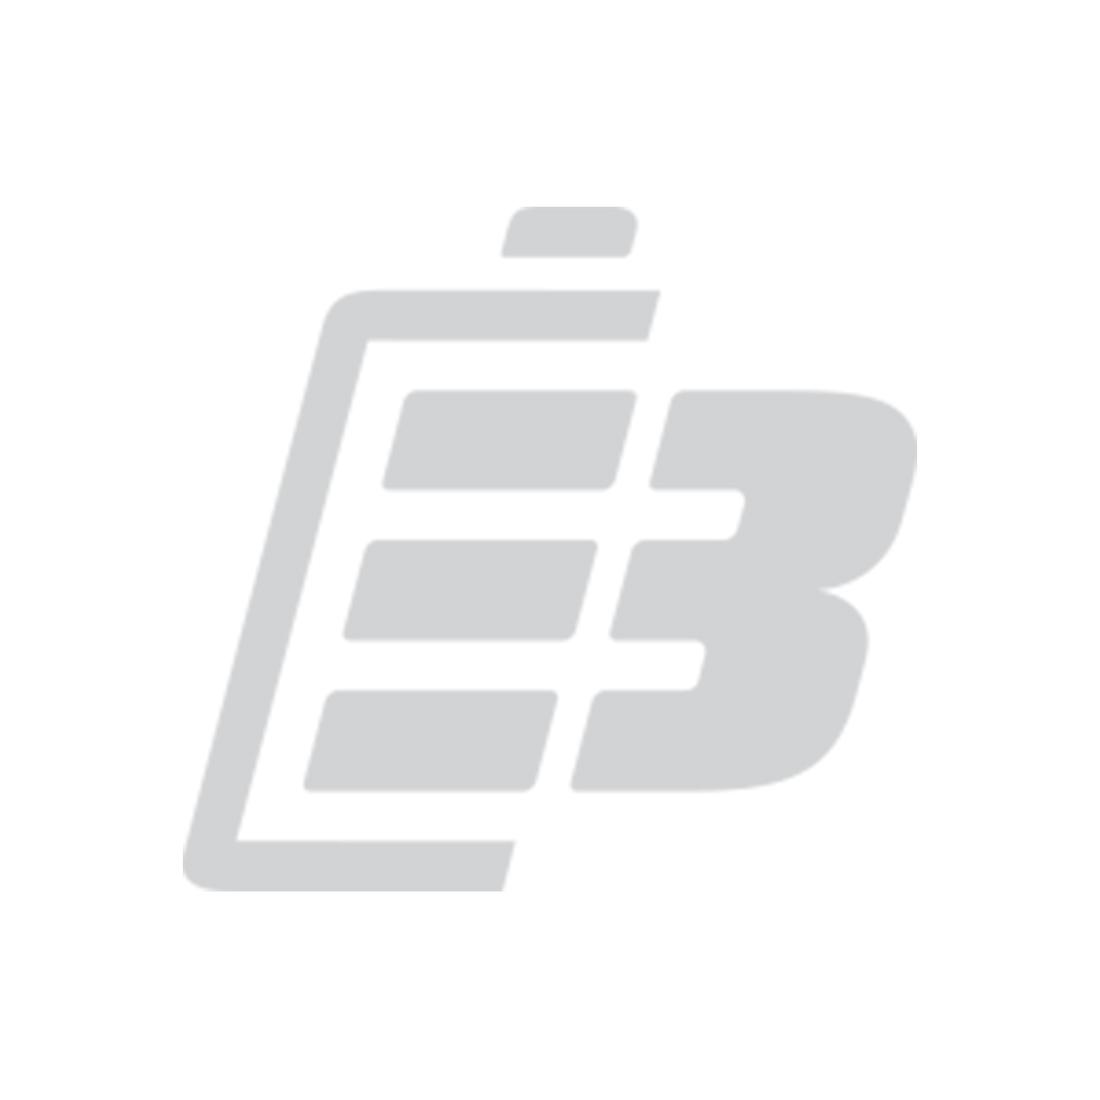 Fenix ALG-03 Headlamp Helmet Mount 1